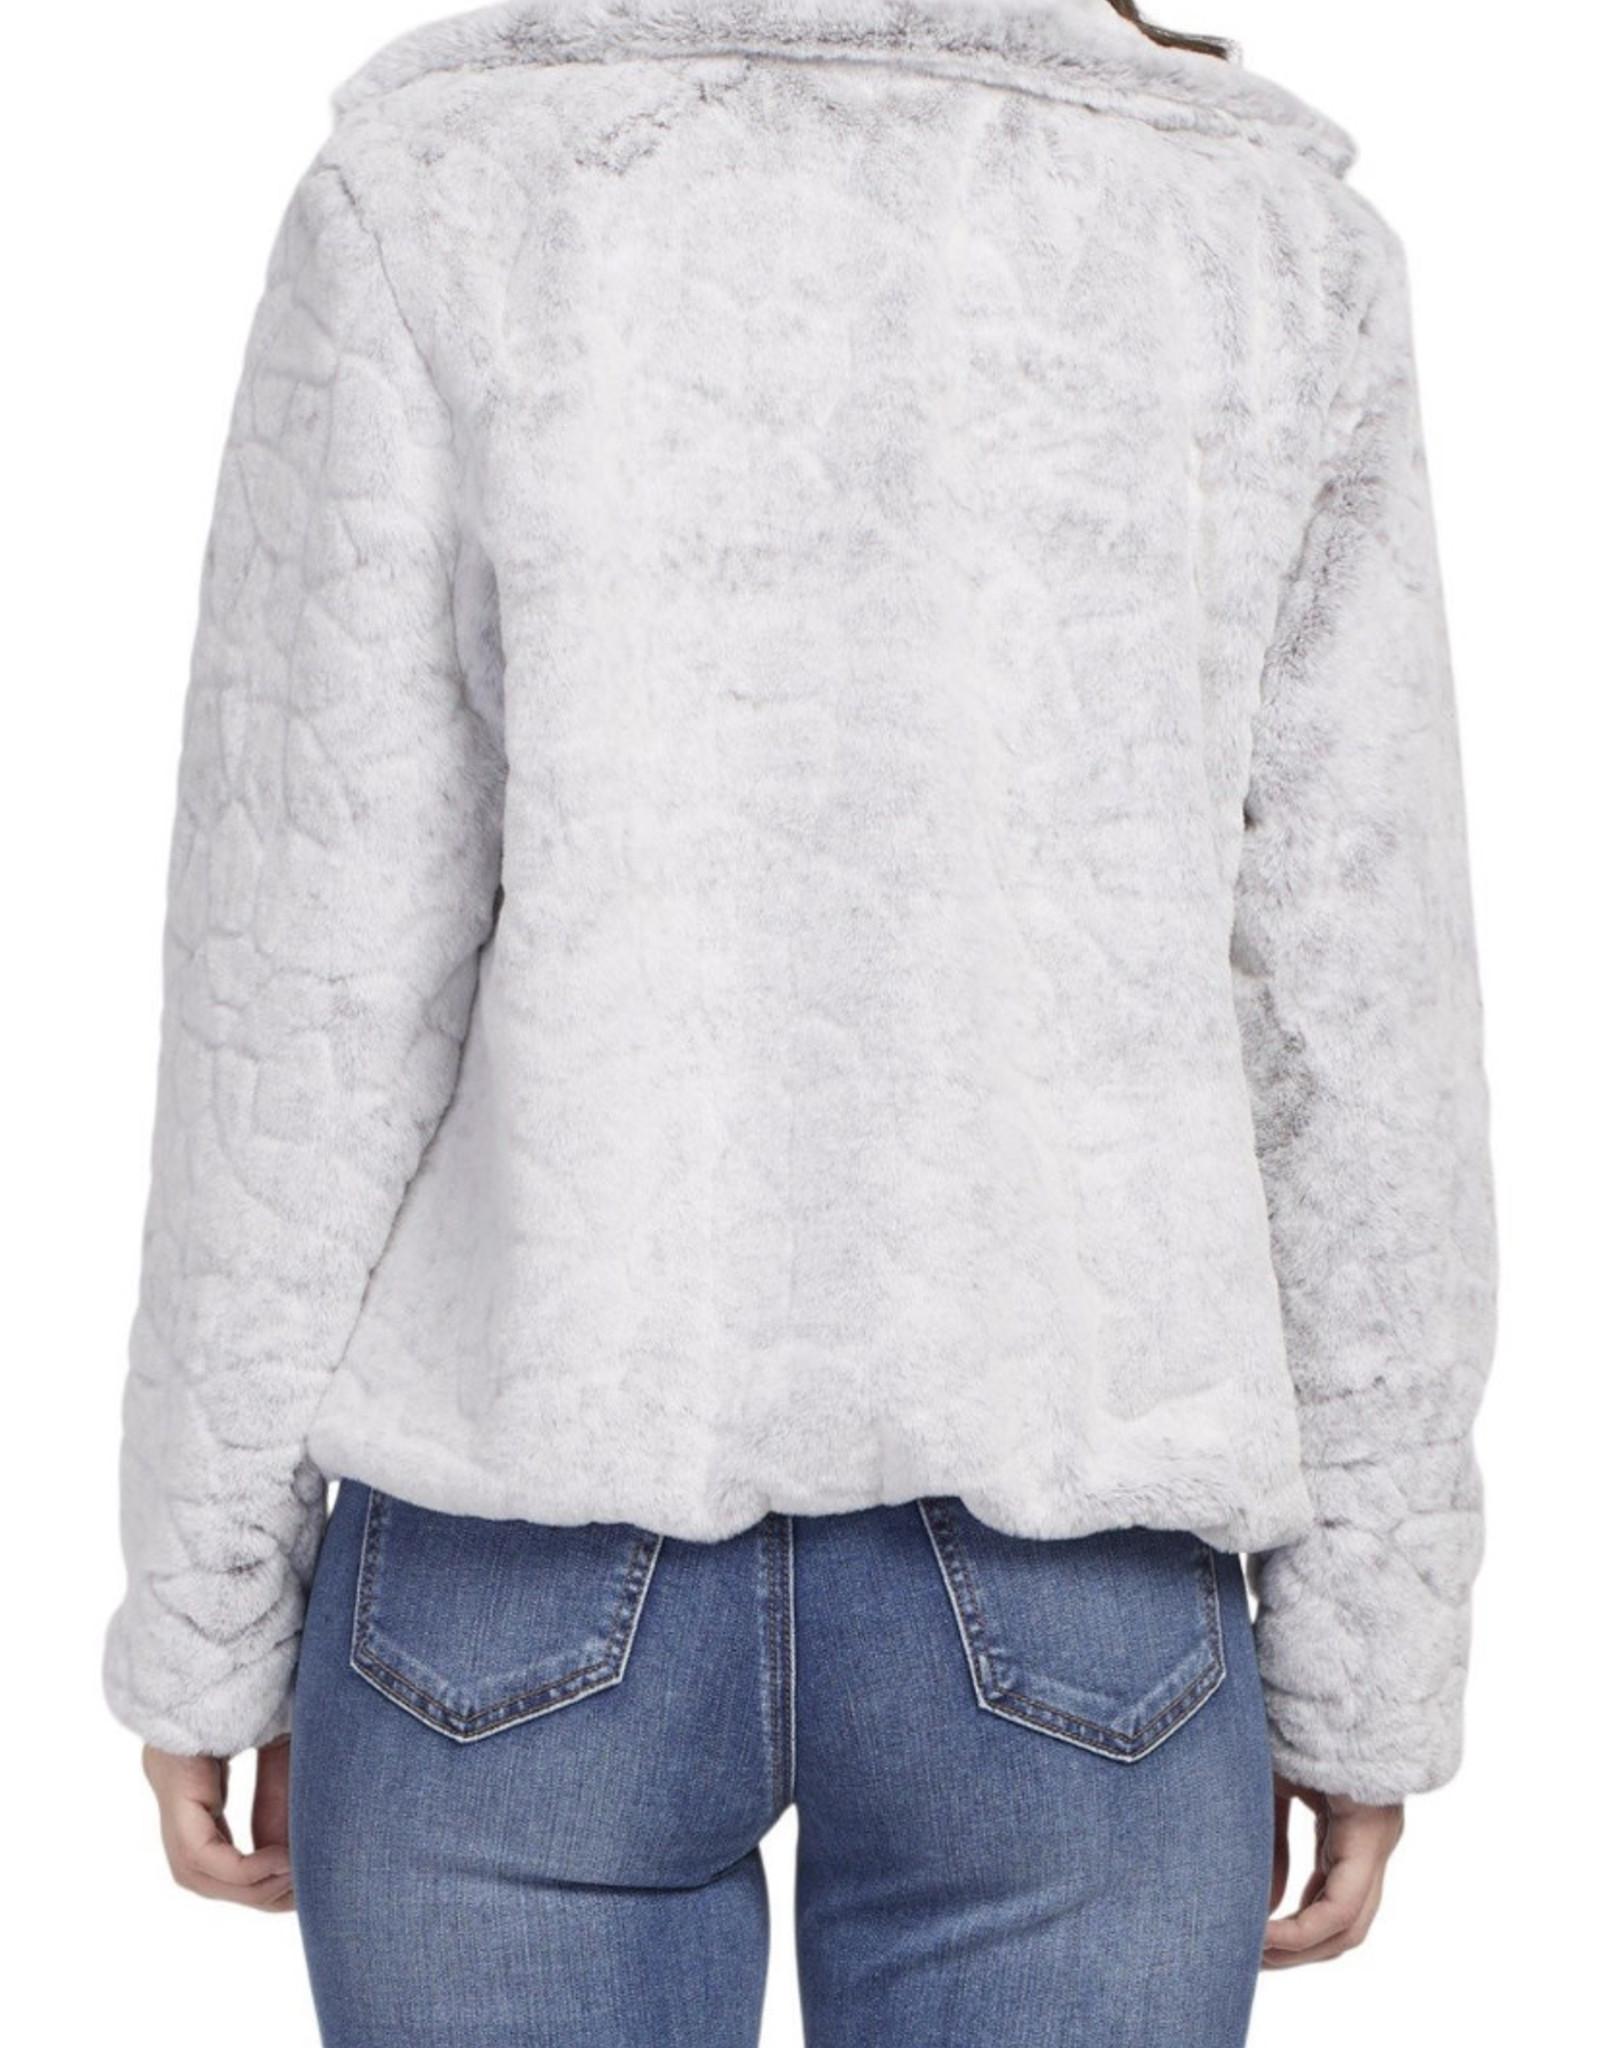 Silver snuggle jacket